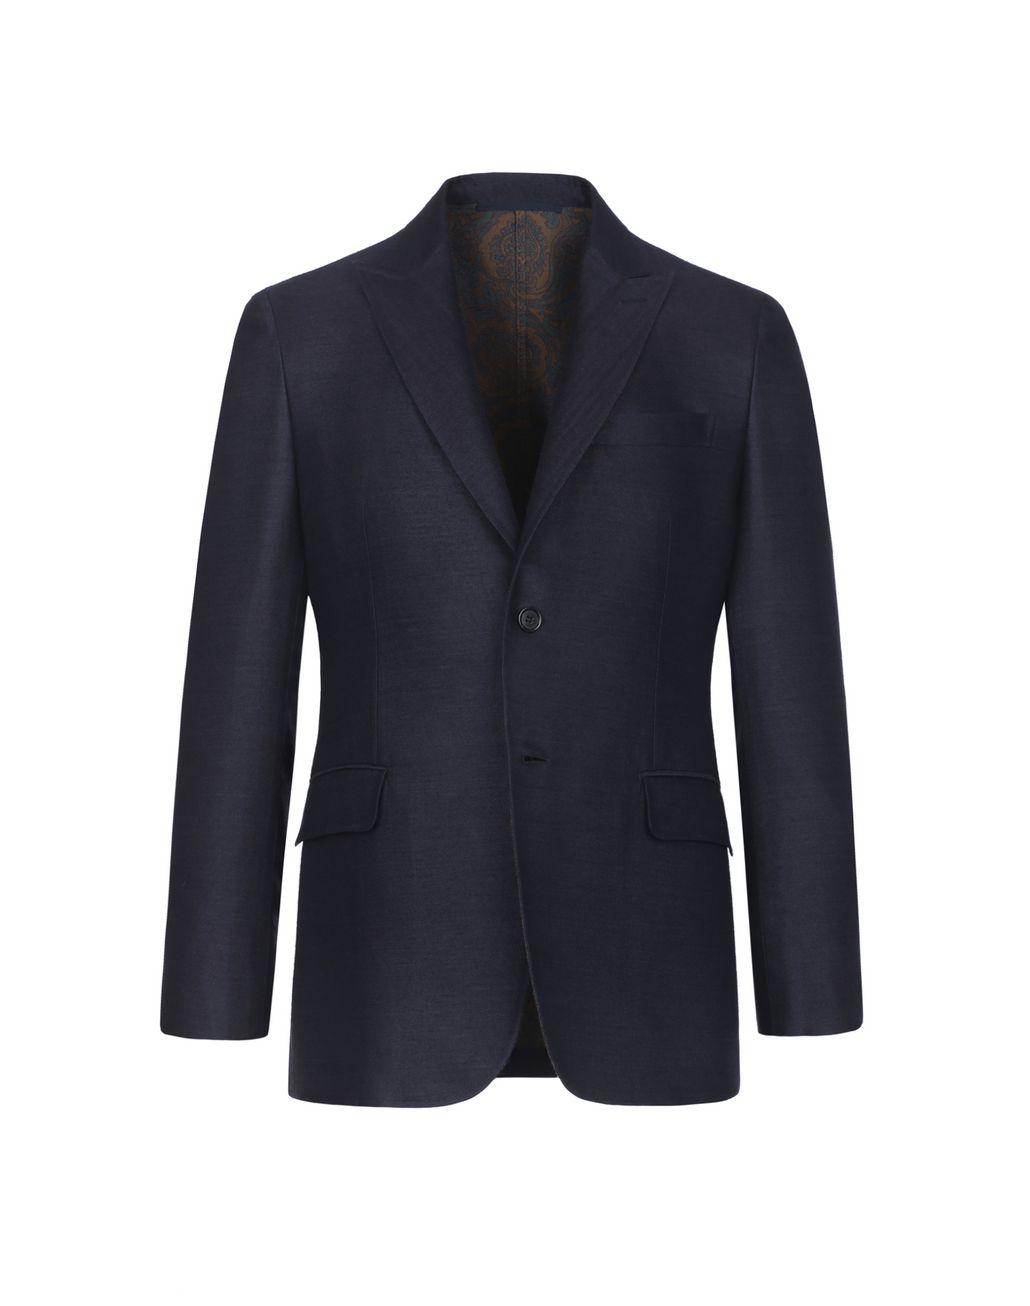 BRIONI Синий Пиджак На Подкладке С Узором Пейсли Suits & Jackets Для Мужчин f